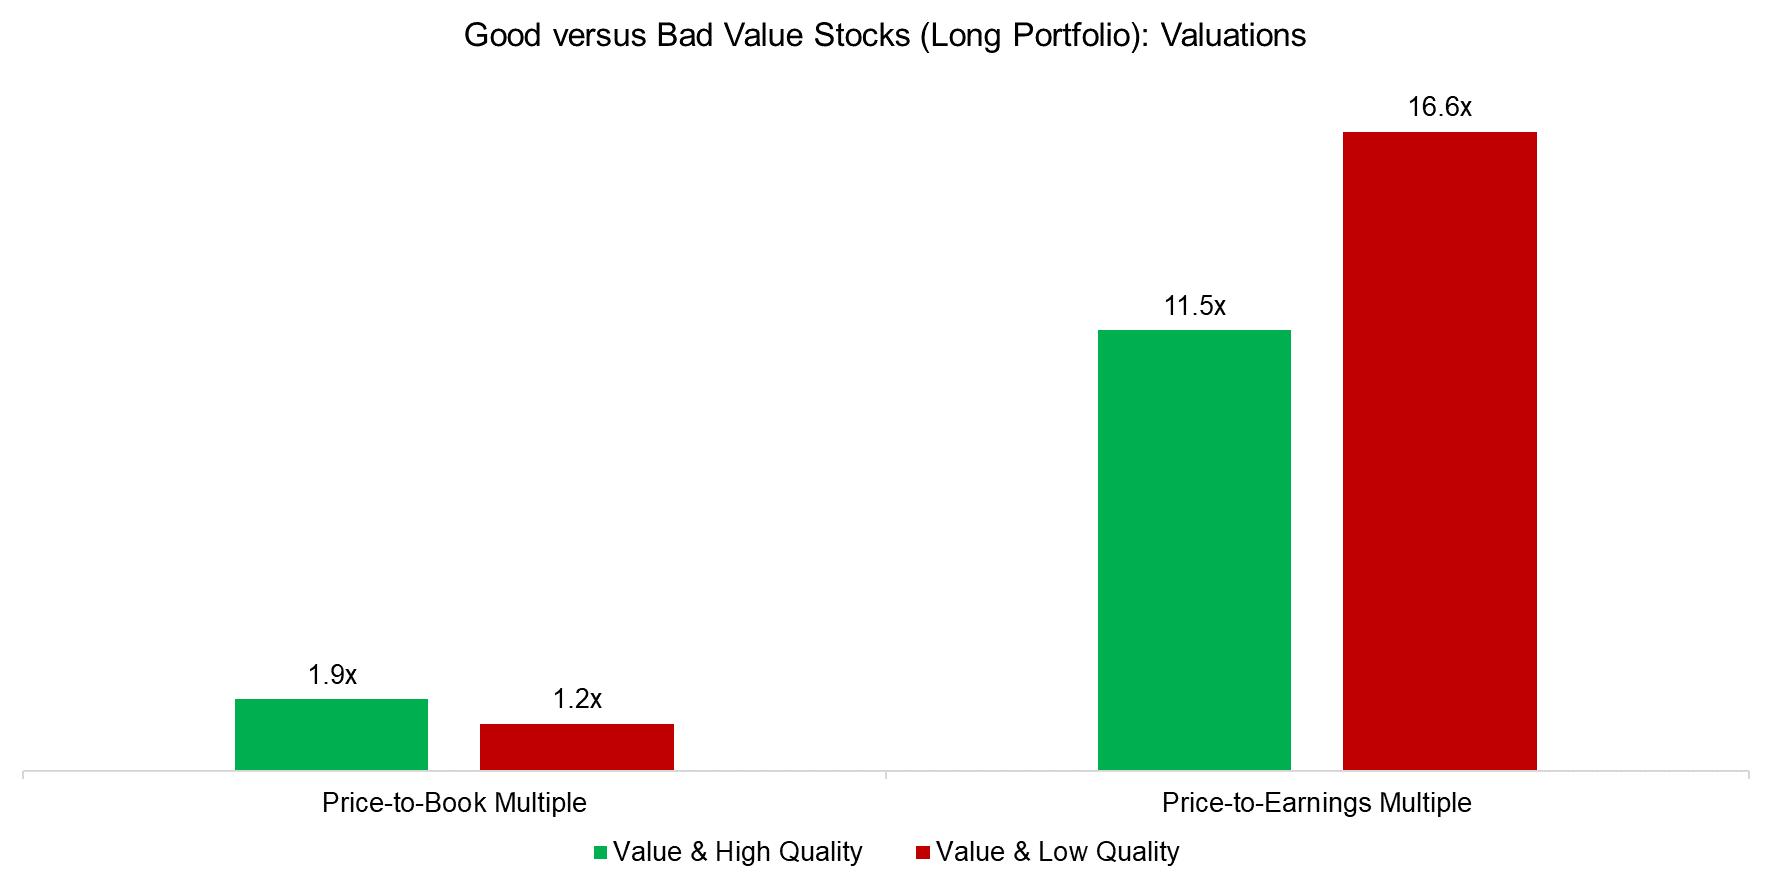 Good versus Bad Value Stocks (Long Portfolio) Valuations